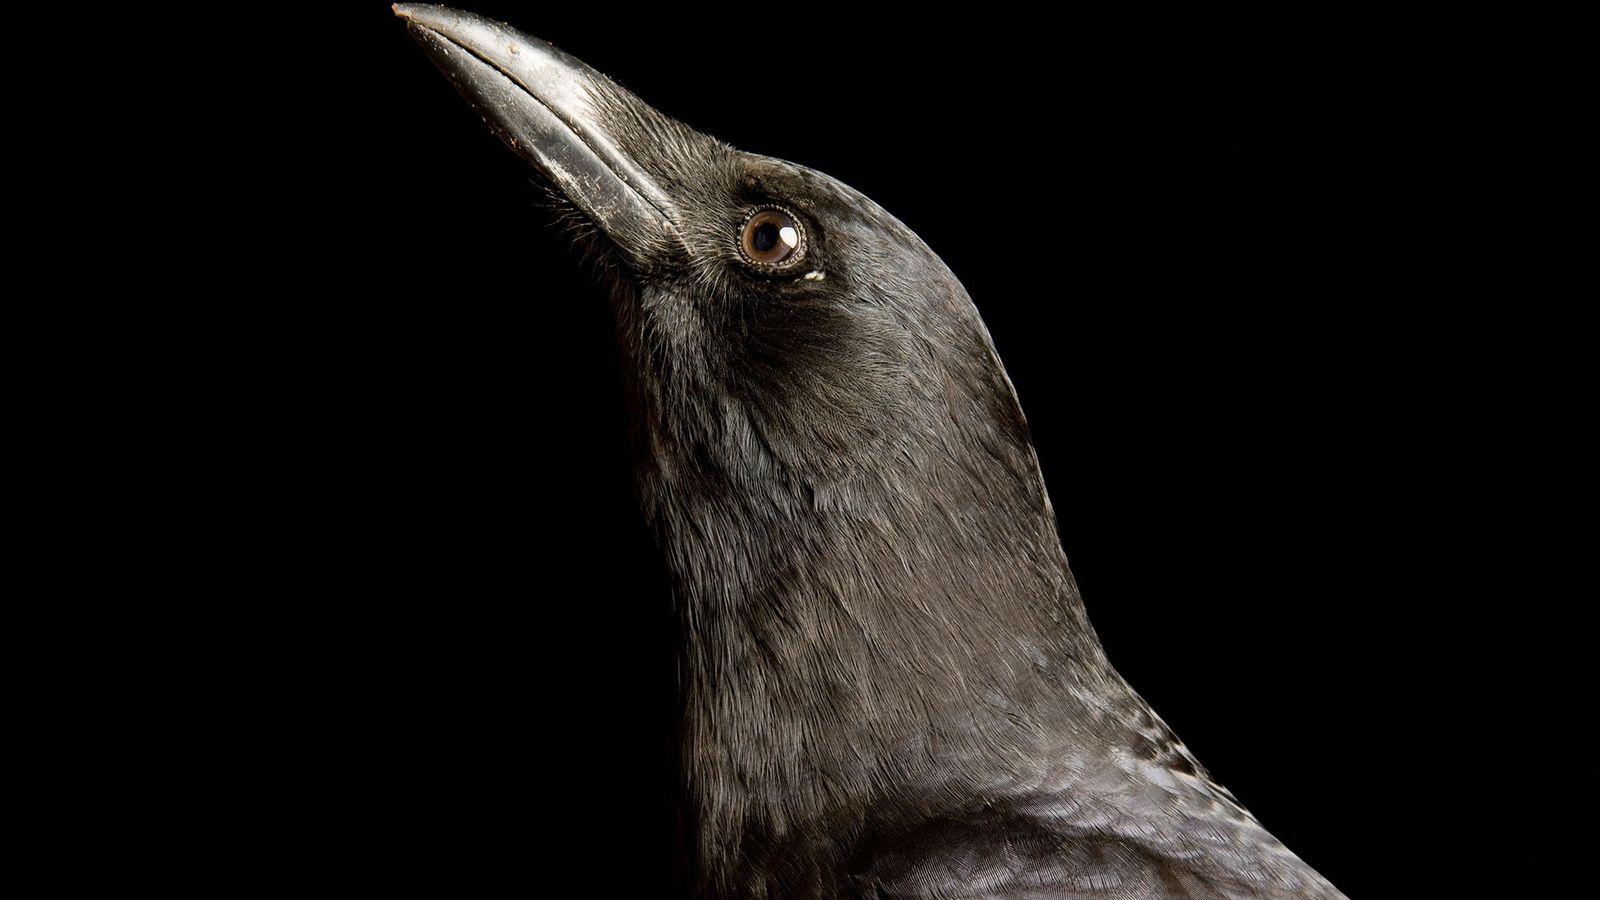 Corvo-americano, corvus brachyrhynchos